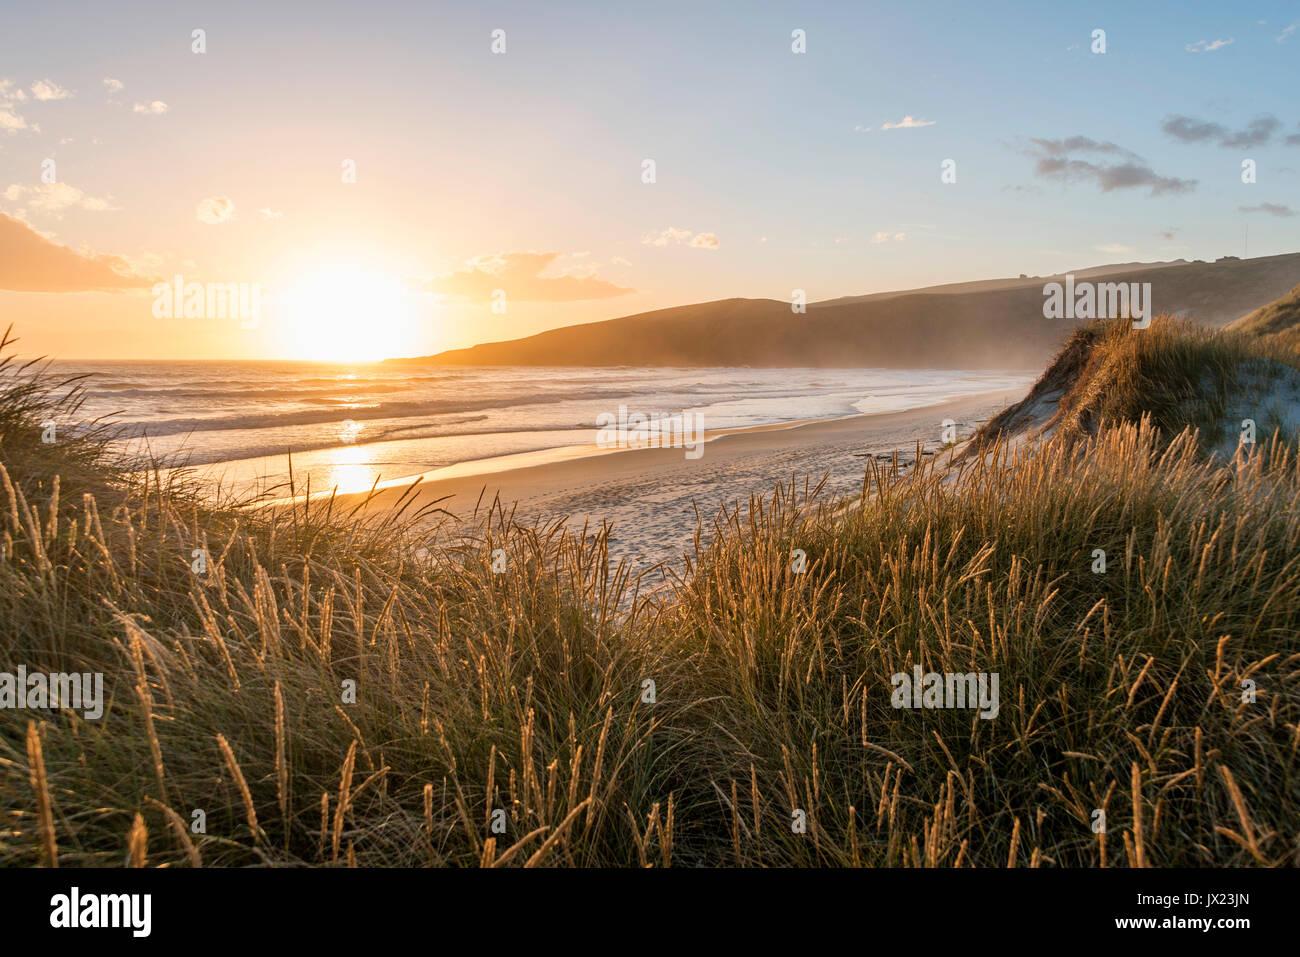 Sunset on the beach, Sandfly Bay, Otago, South Island, New Zealand - Stock Image